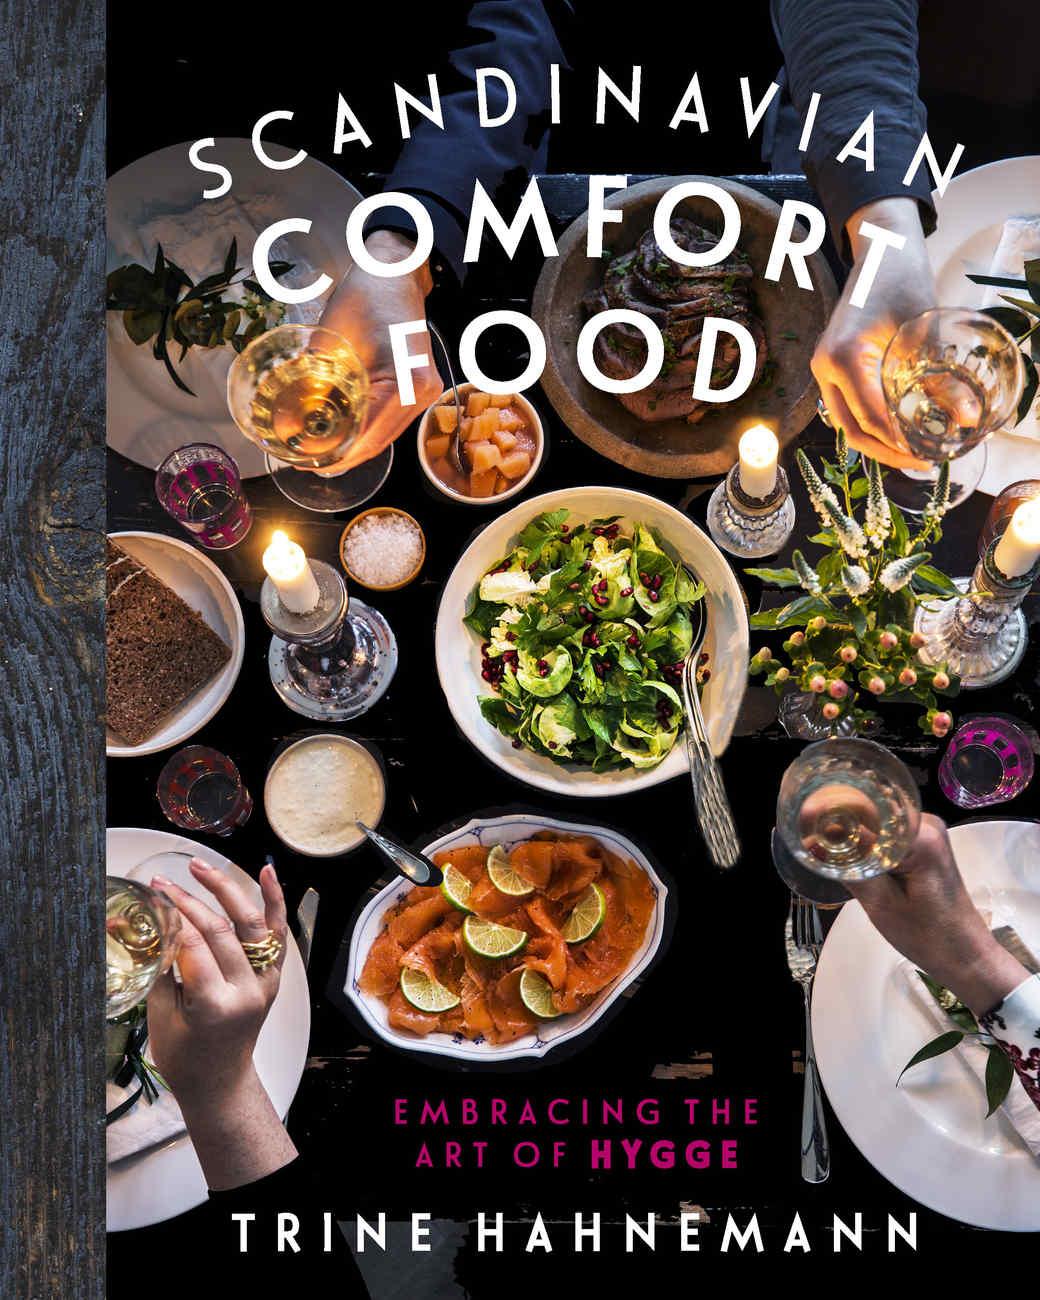 Cover of Trine Hahnemann's Scandinavian Comfort Food